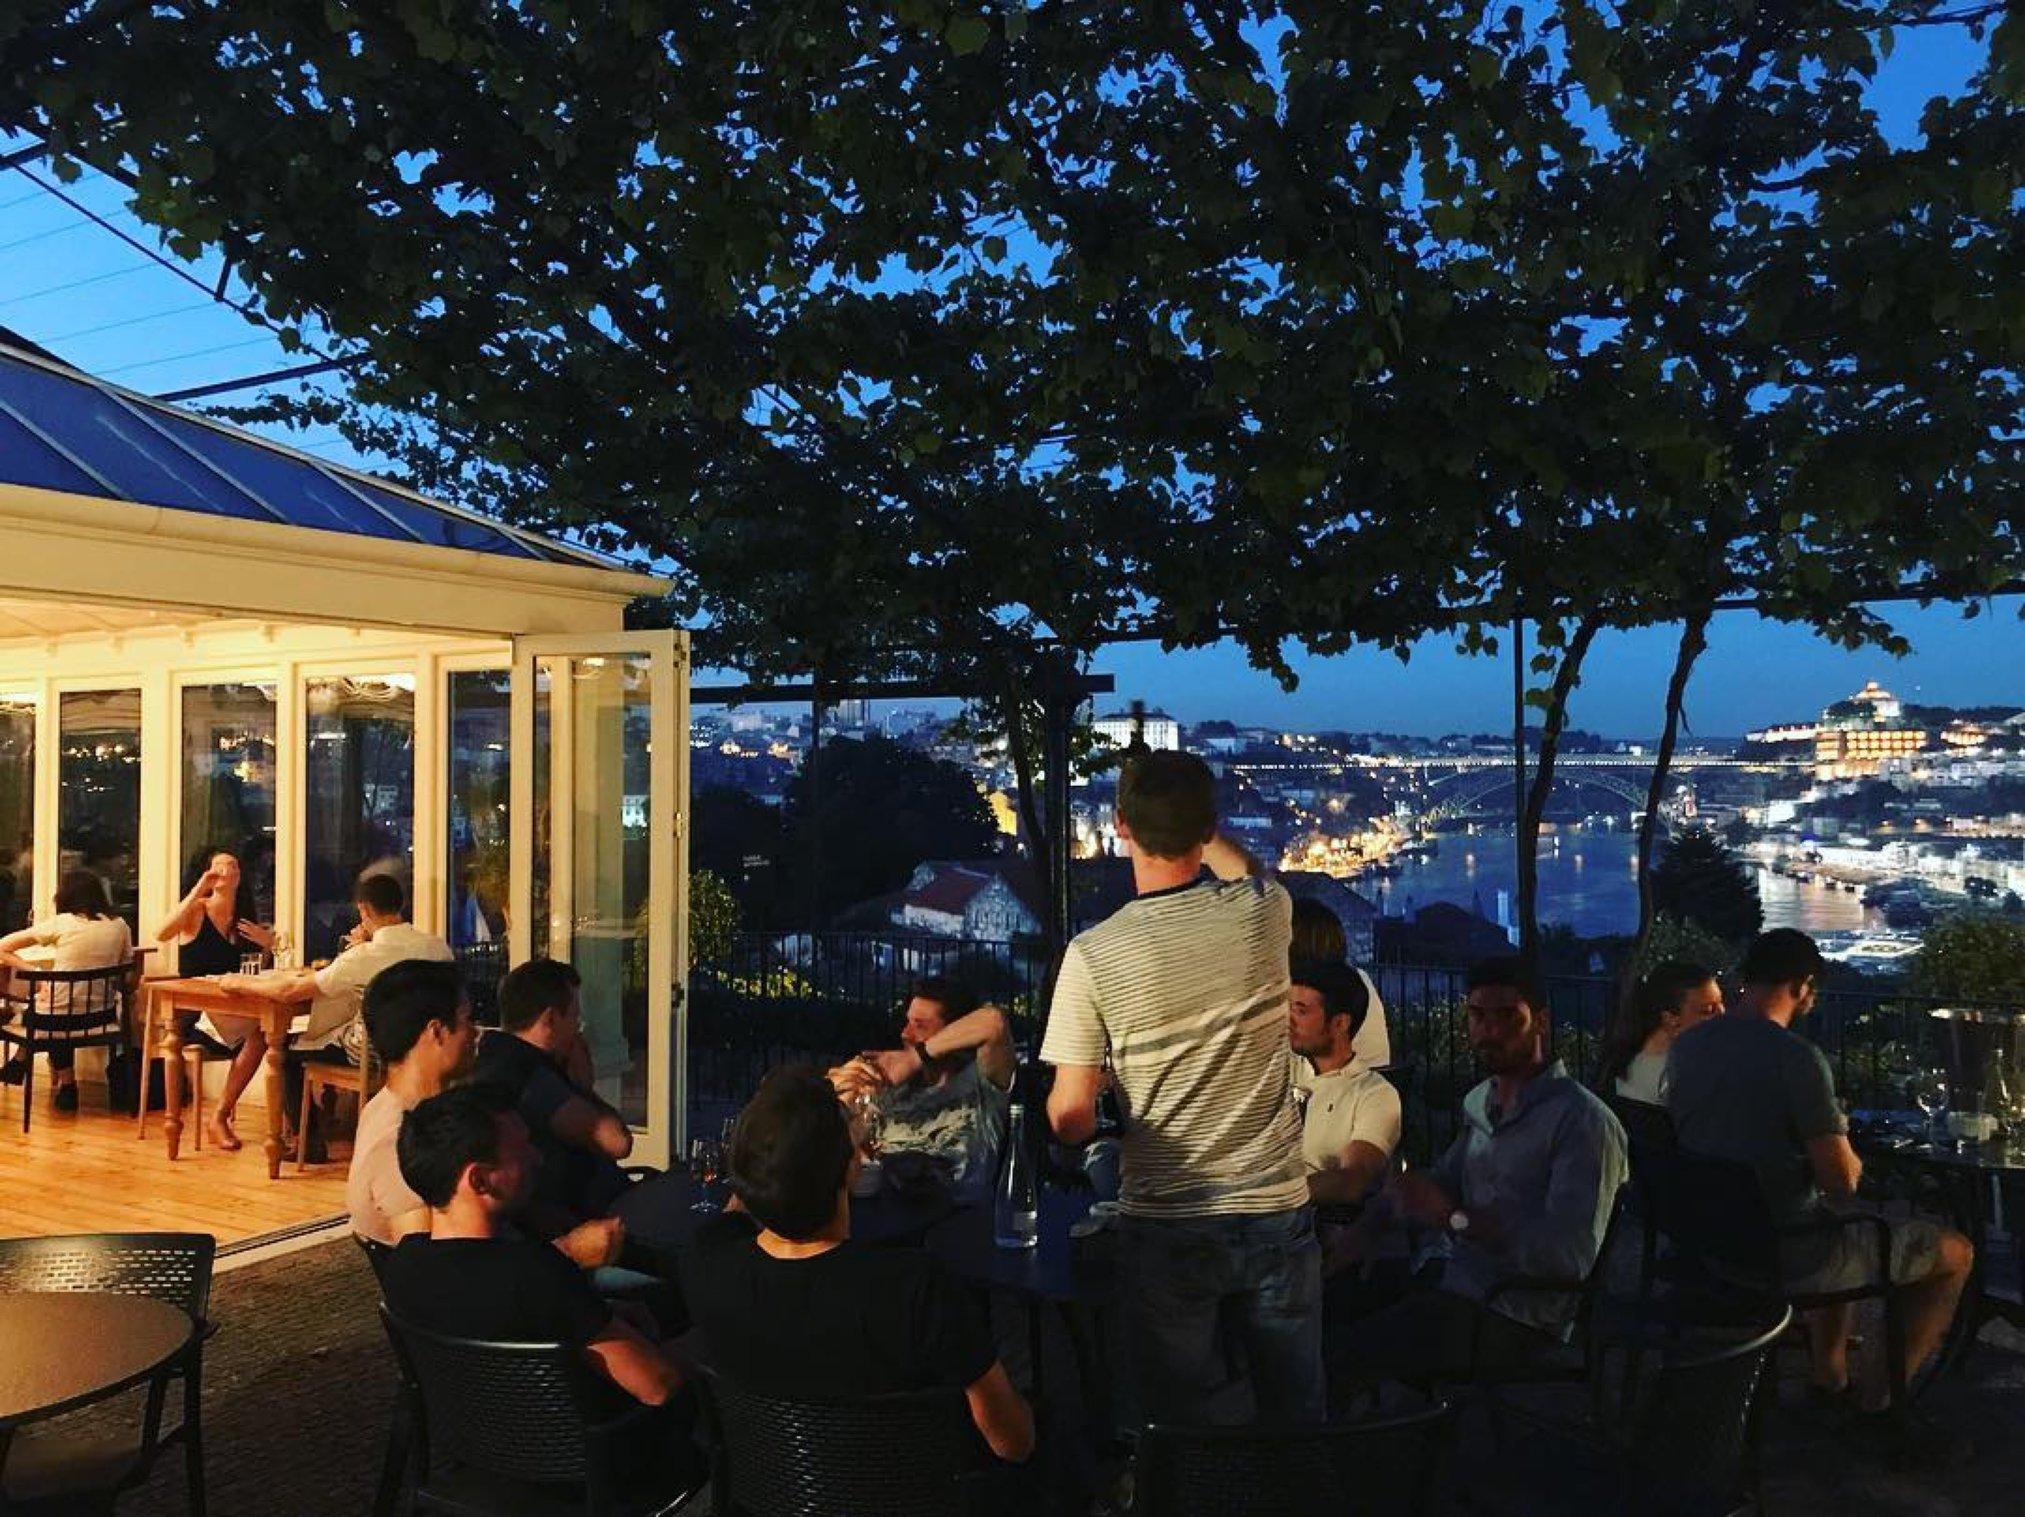 Terrasse - Rooftop - Vinum Restaurant Bar - Caves Porto Grahams - Vila Nova de Gaia - Porto